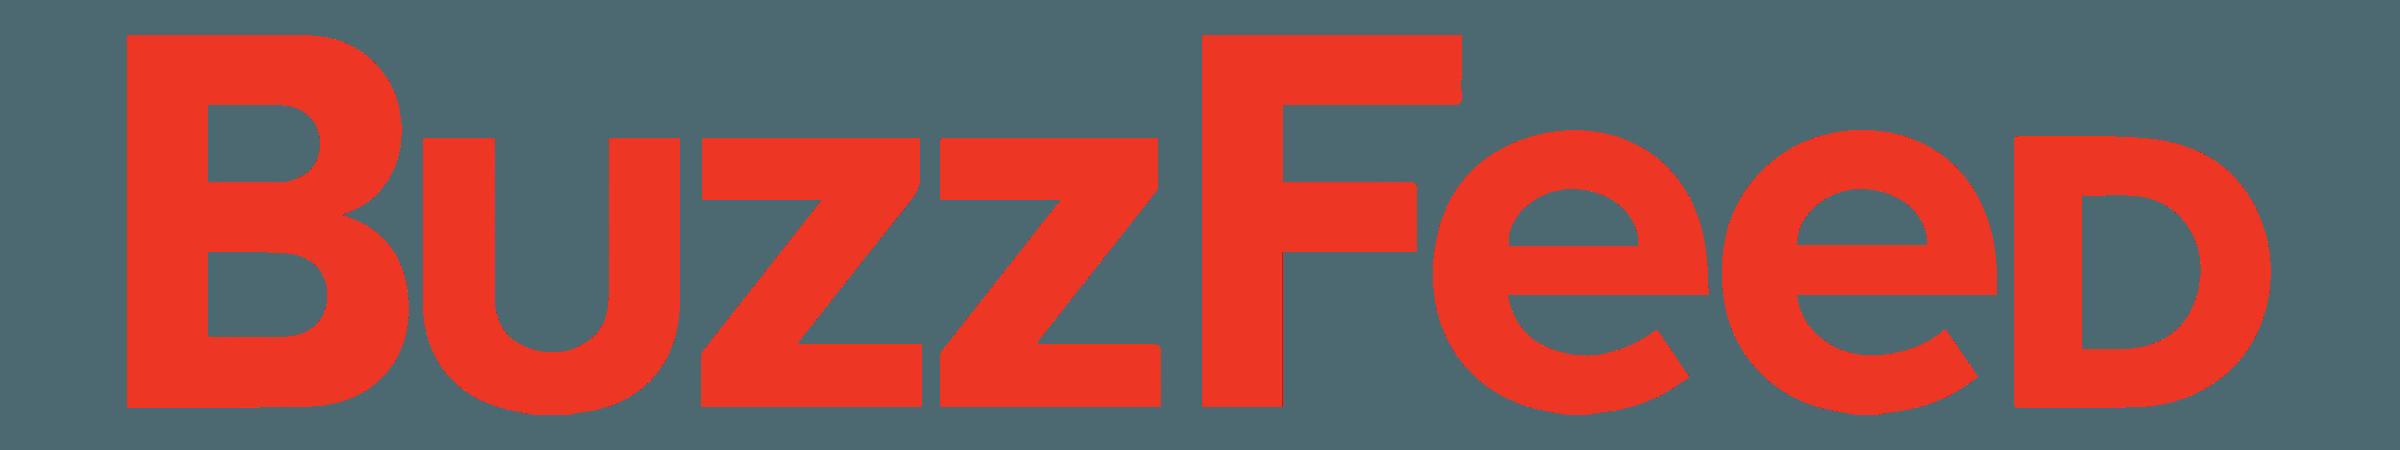 buzzfeed-logo-transparent.png